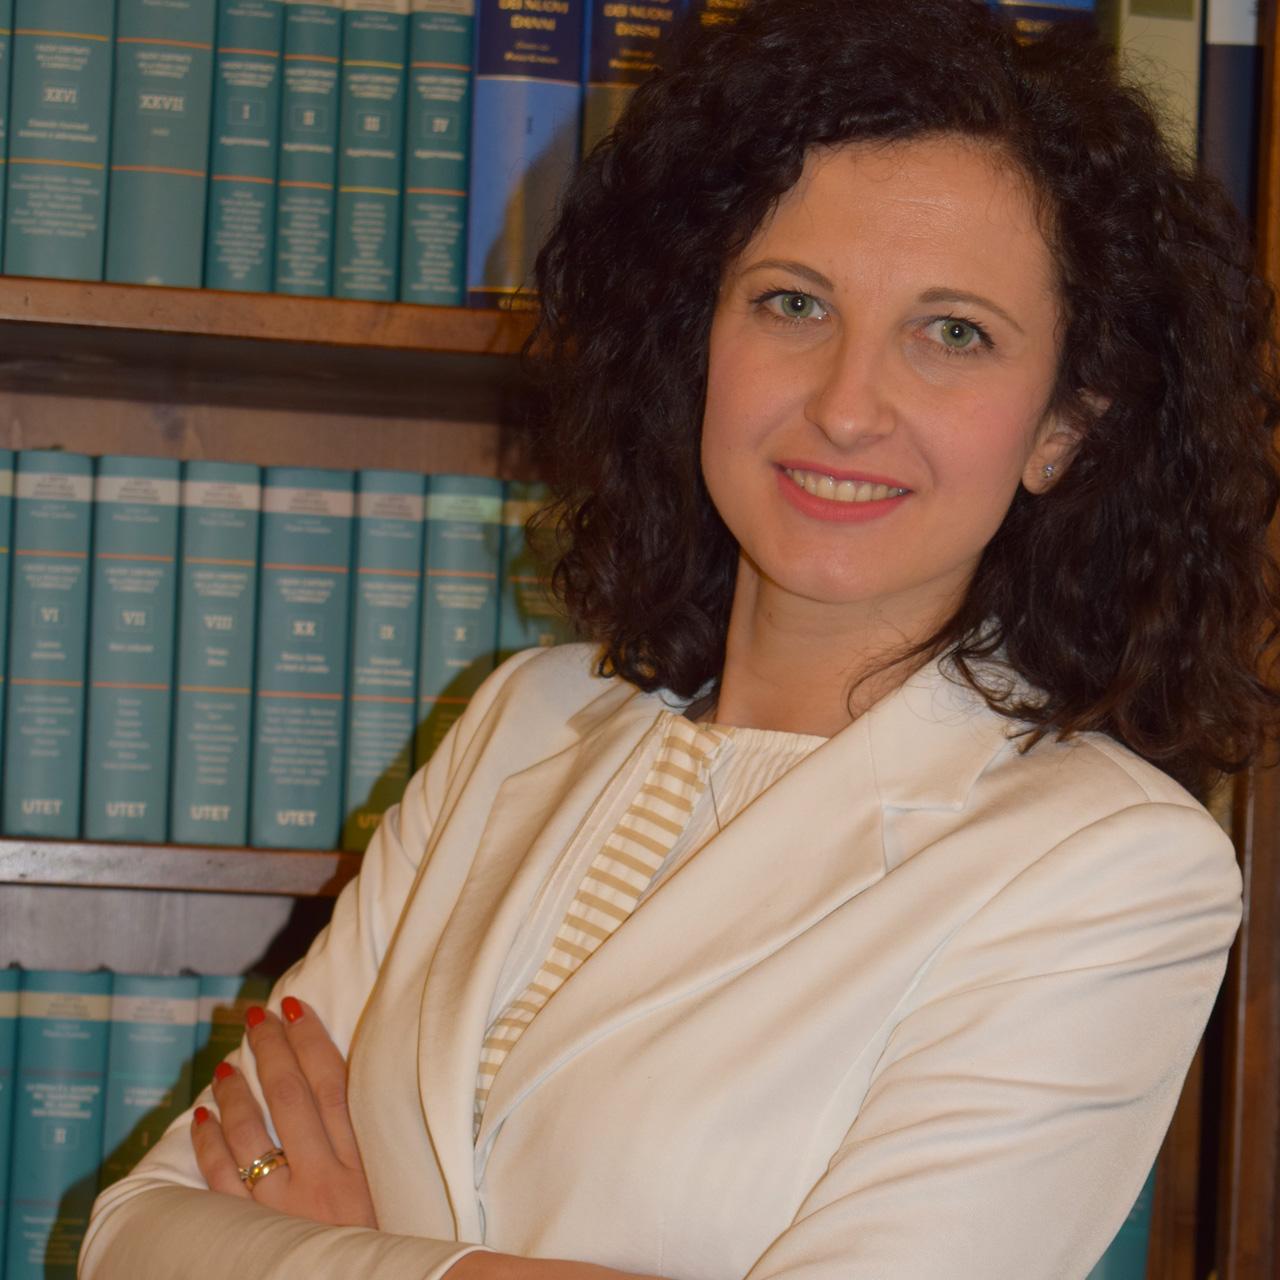 giuseppina-napoli-avvocato-imola